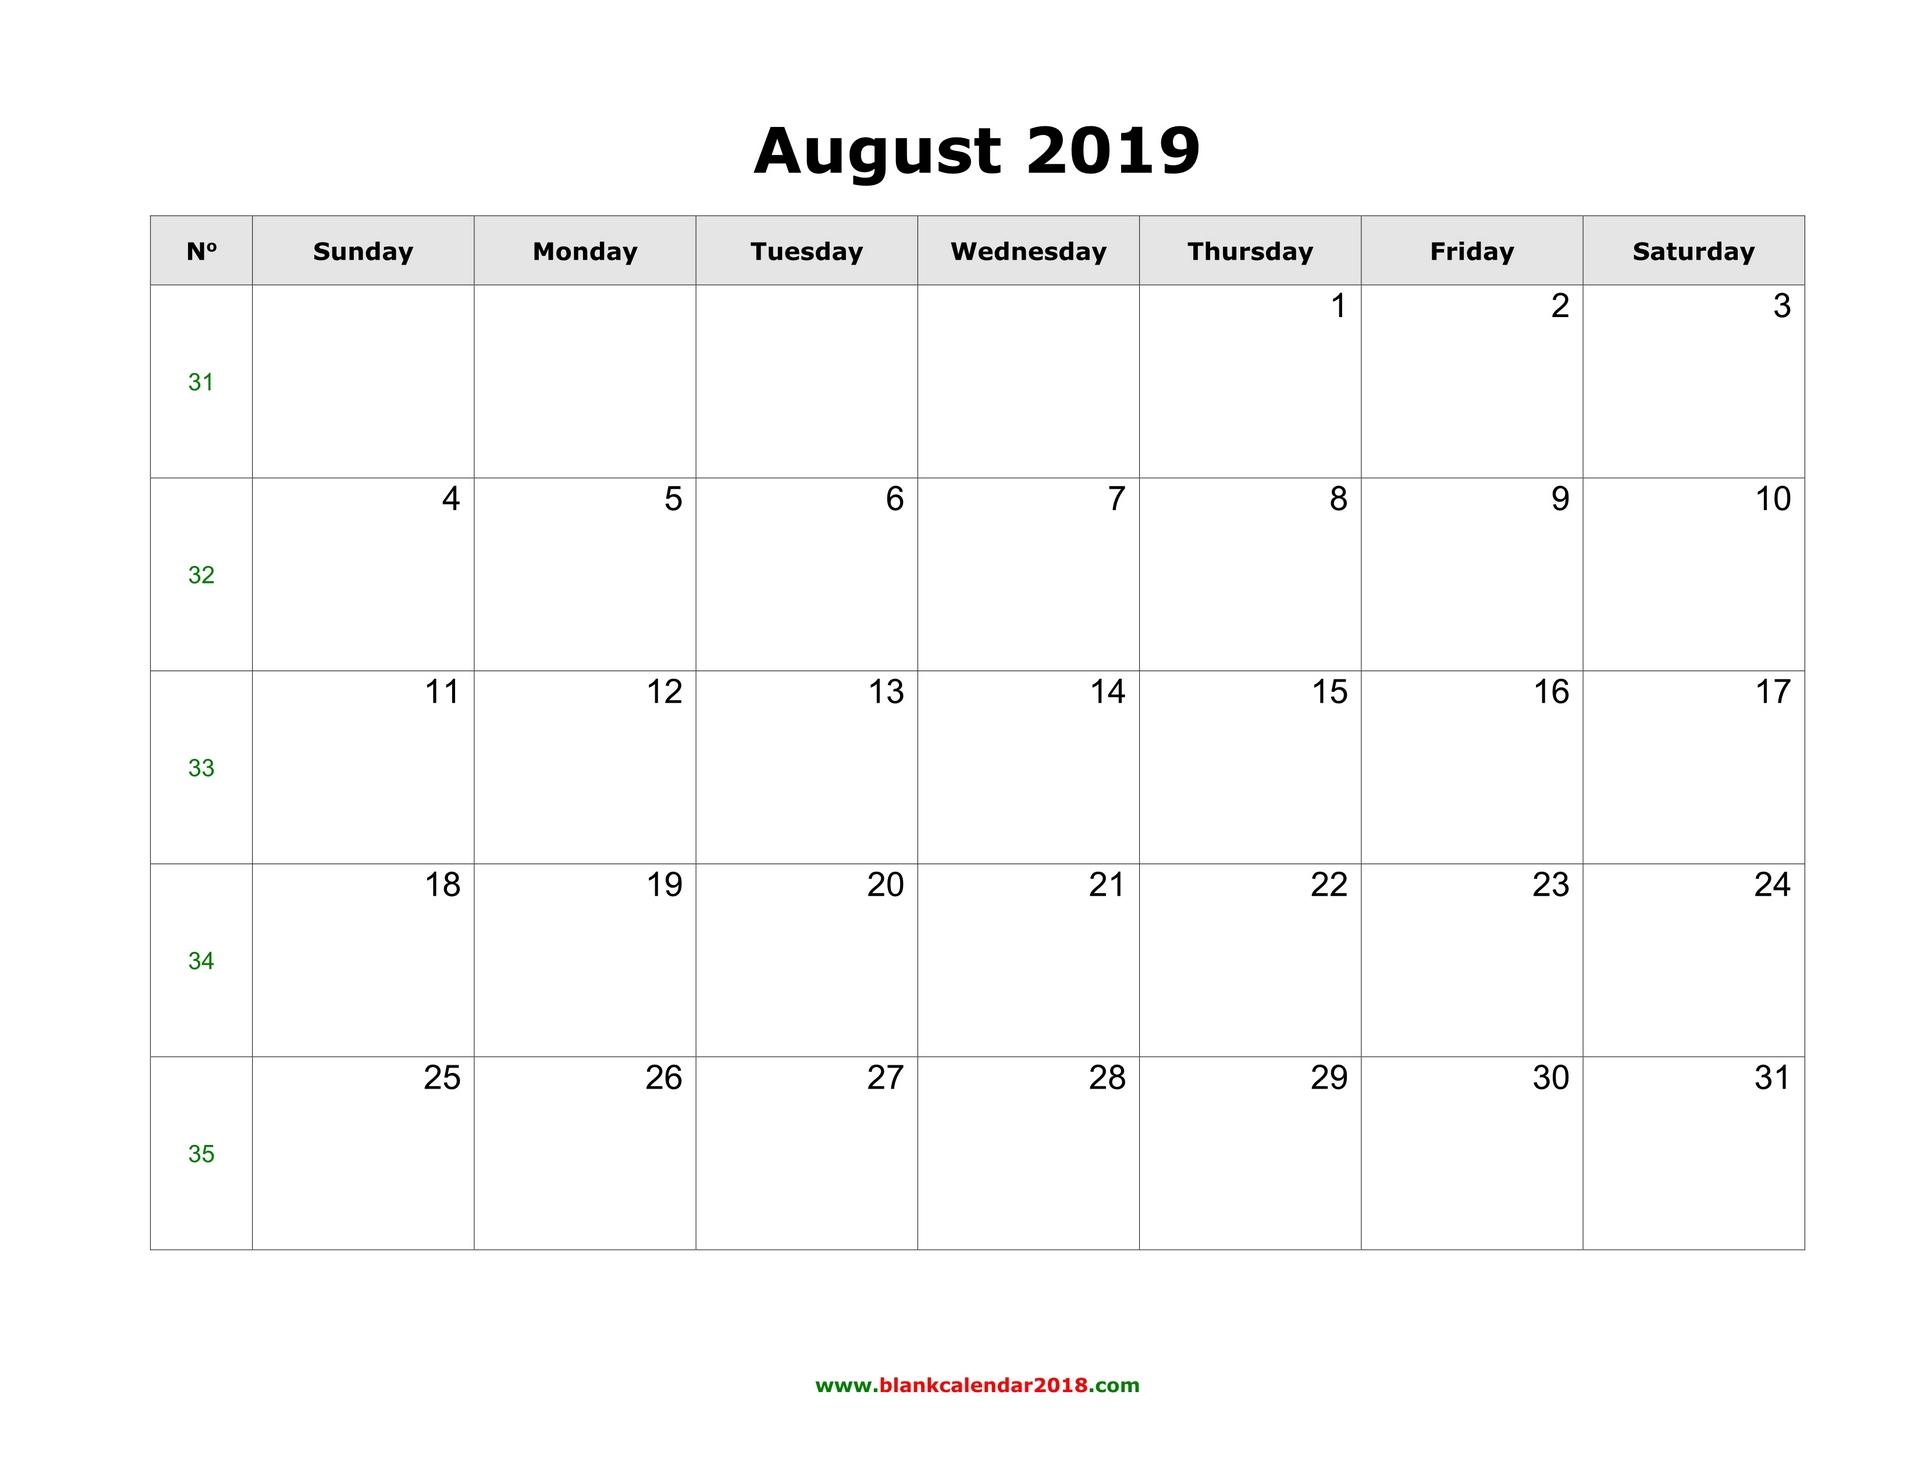 Blank Calendar For August 2019 regarding August Blank Calendar Printable